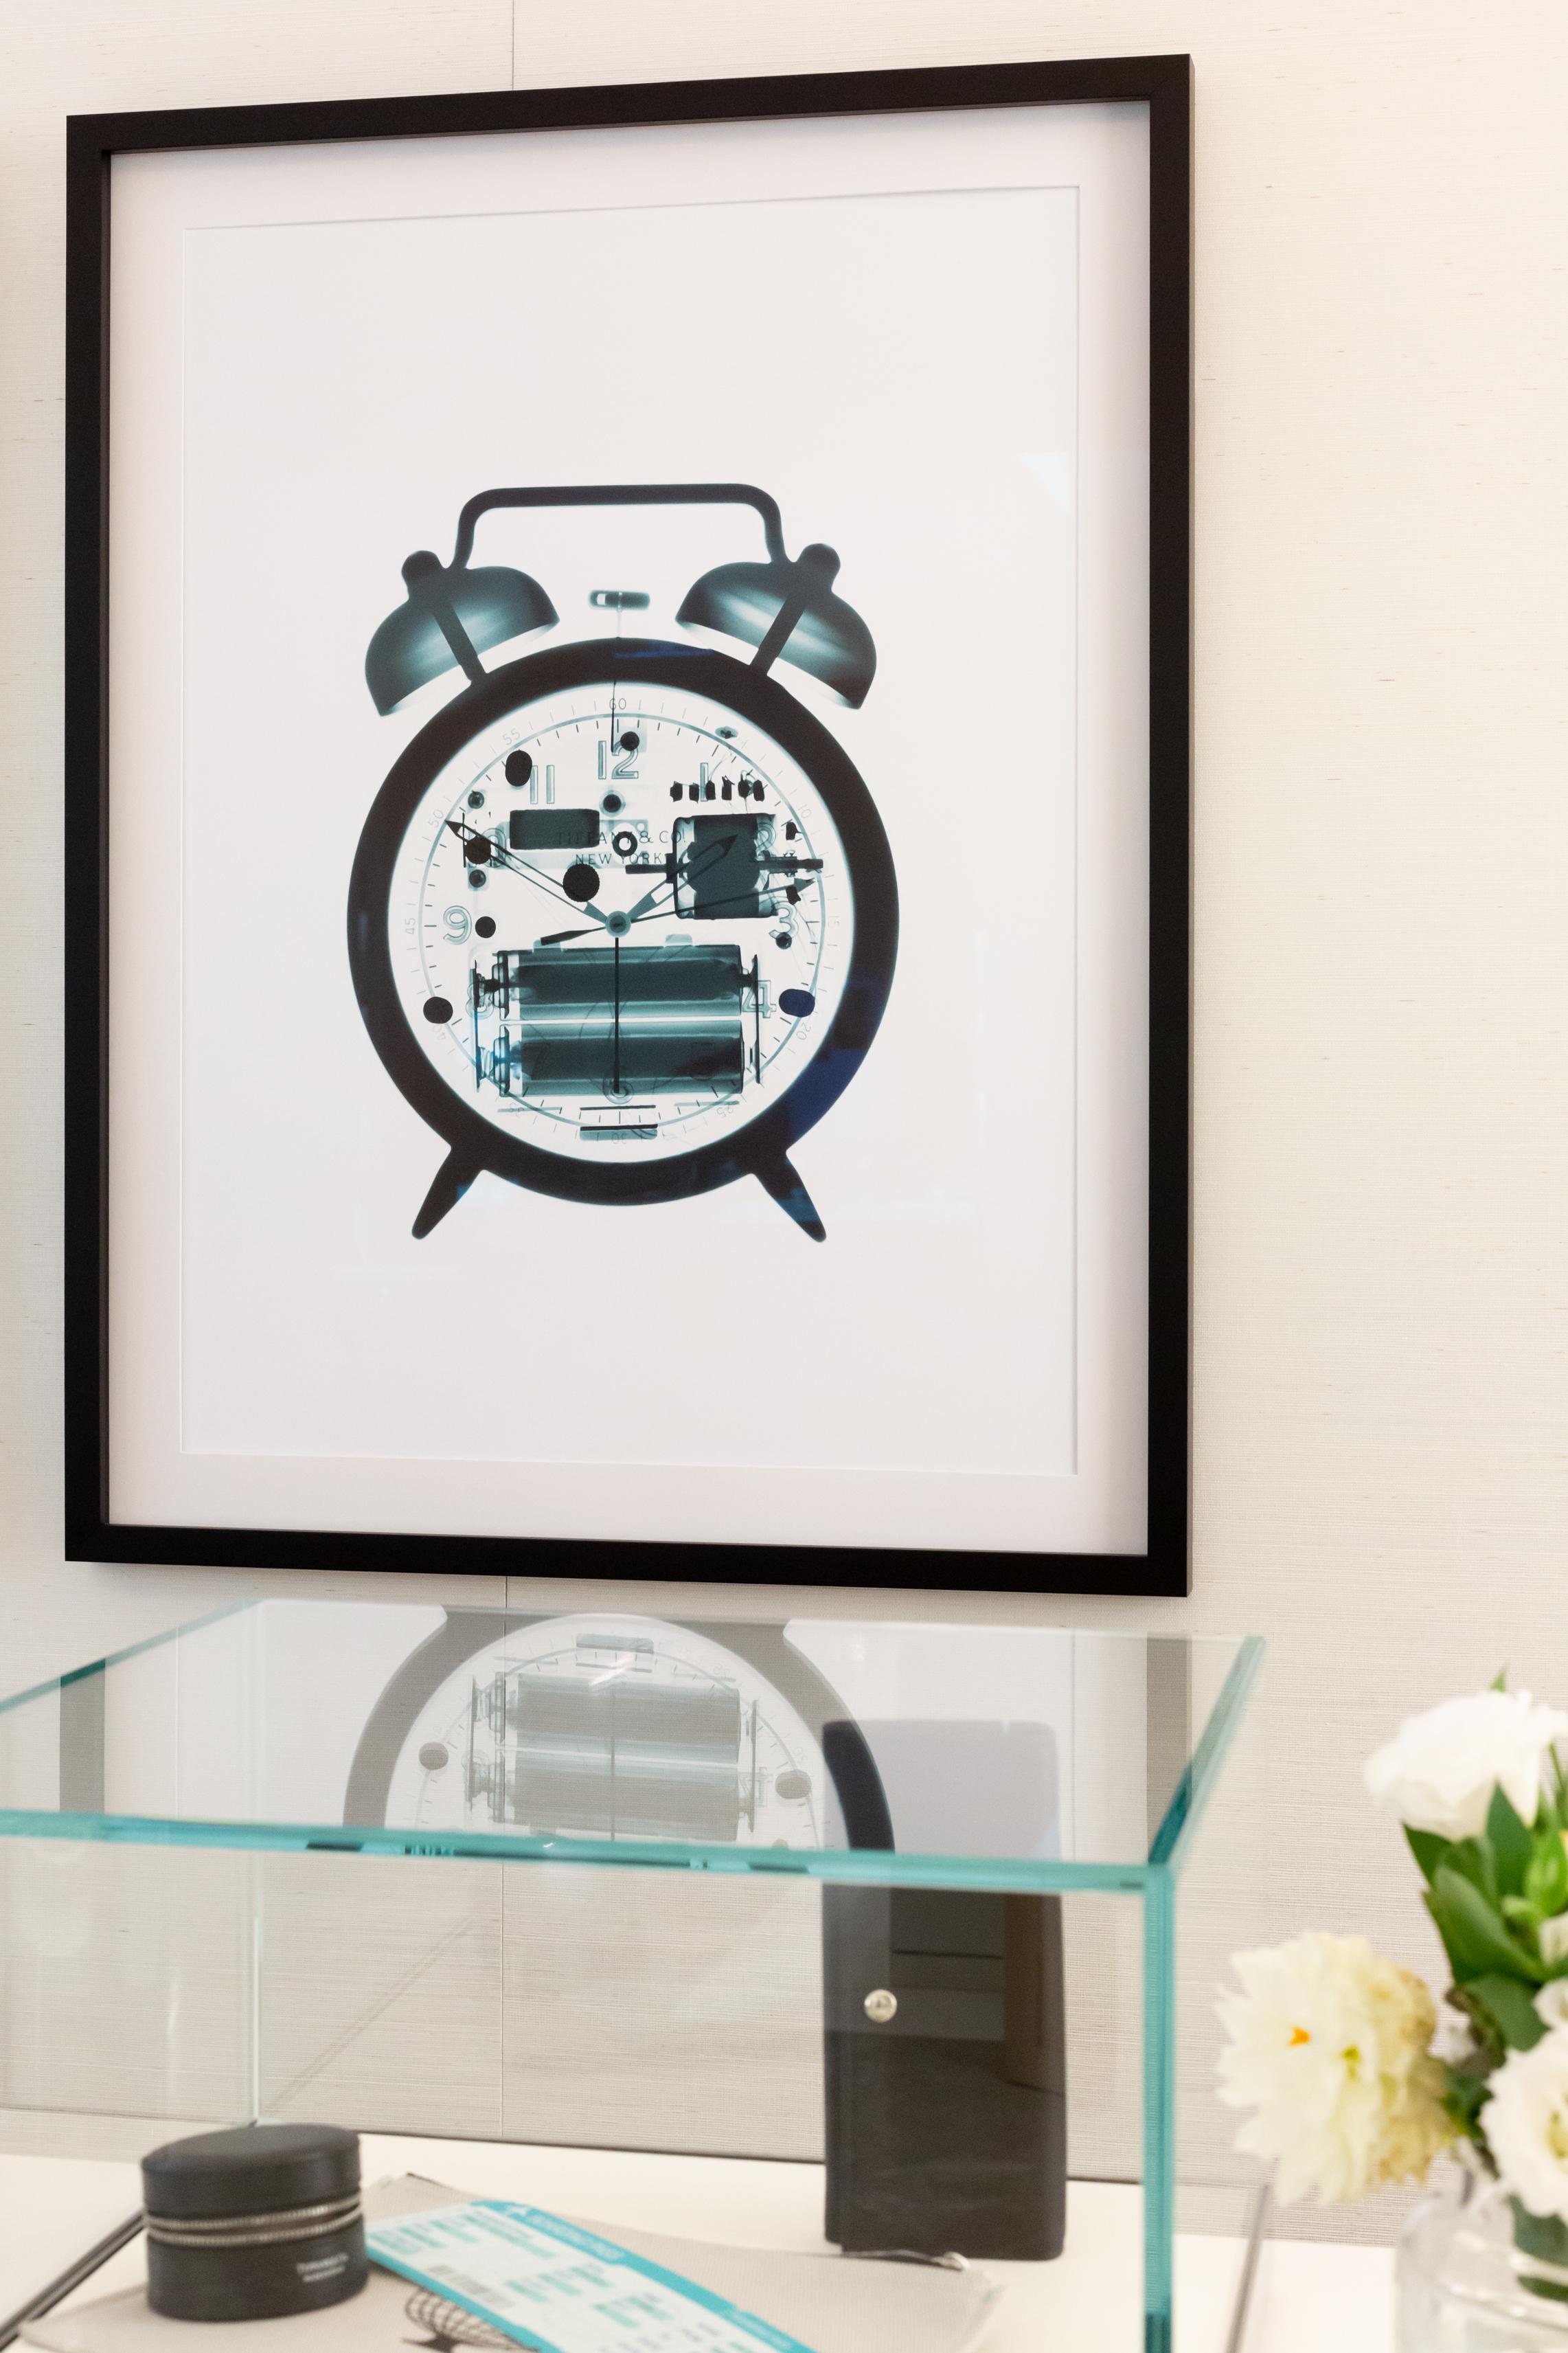 Brendan Fitzpatrick's X-Ray Image in Tiffany & Co. Sydney.  Image Credit: Jodie Barker.